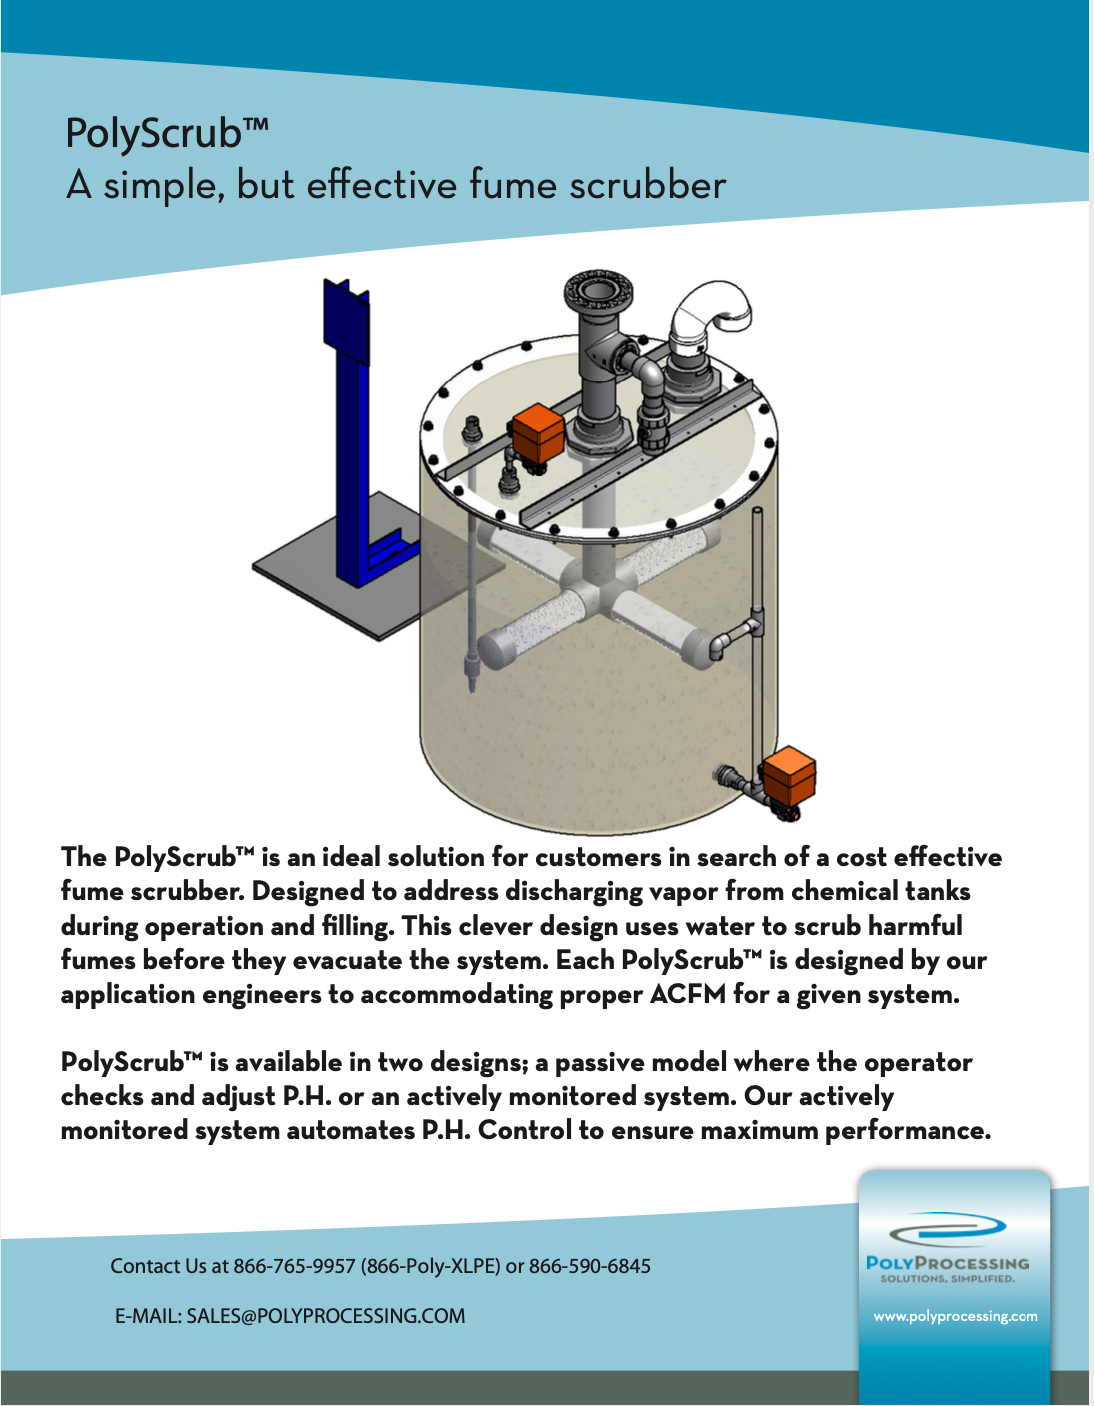 PolyScrub Product Guide Cover